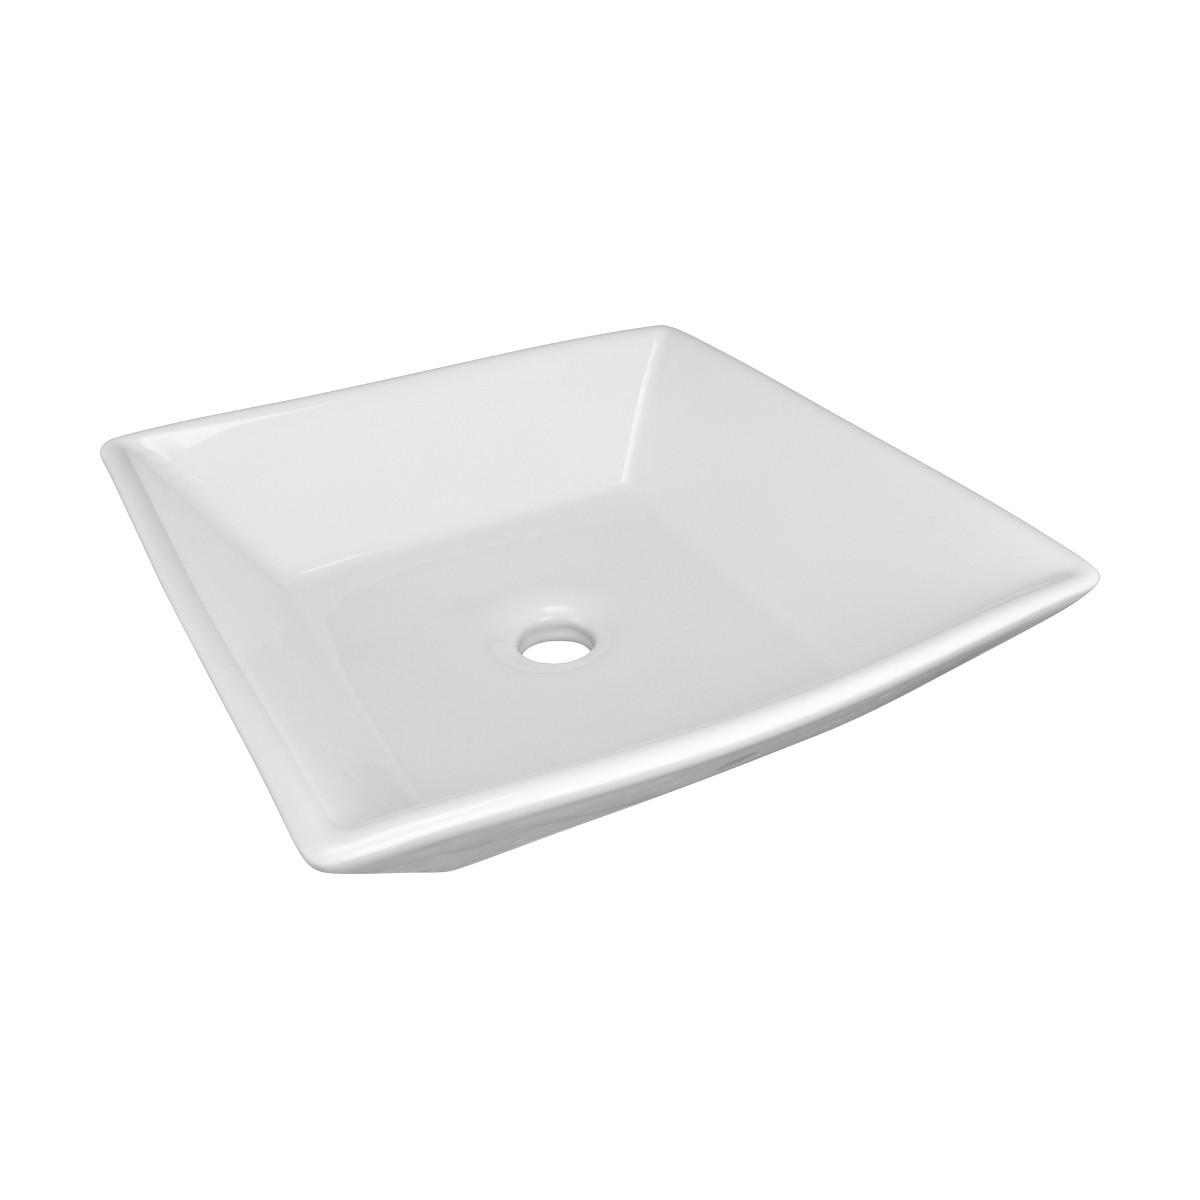 Bathroom Vessel Sink Above Counter White Porcelain Square Gloss Finish Art  Basin